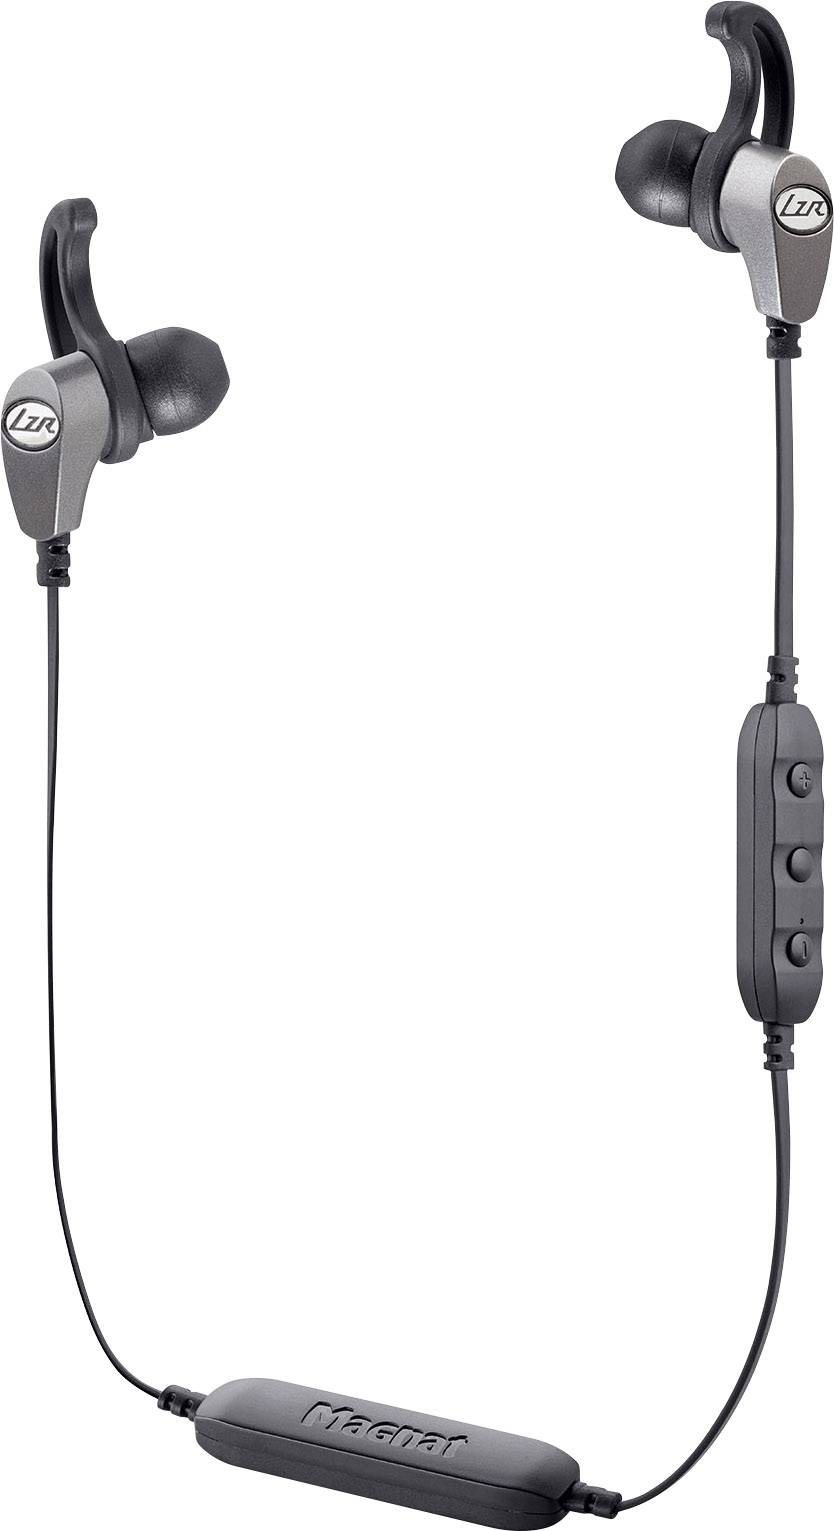 Magnat LZR 548 BT Bluetooth Cu